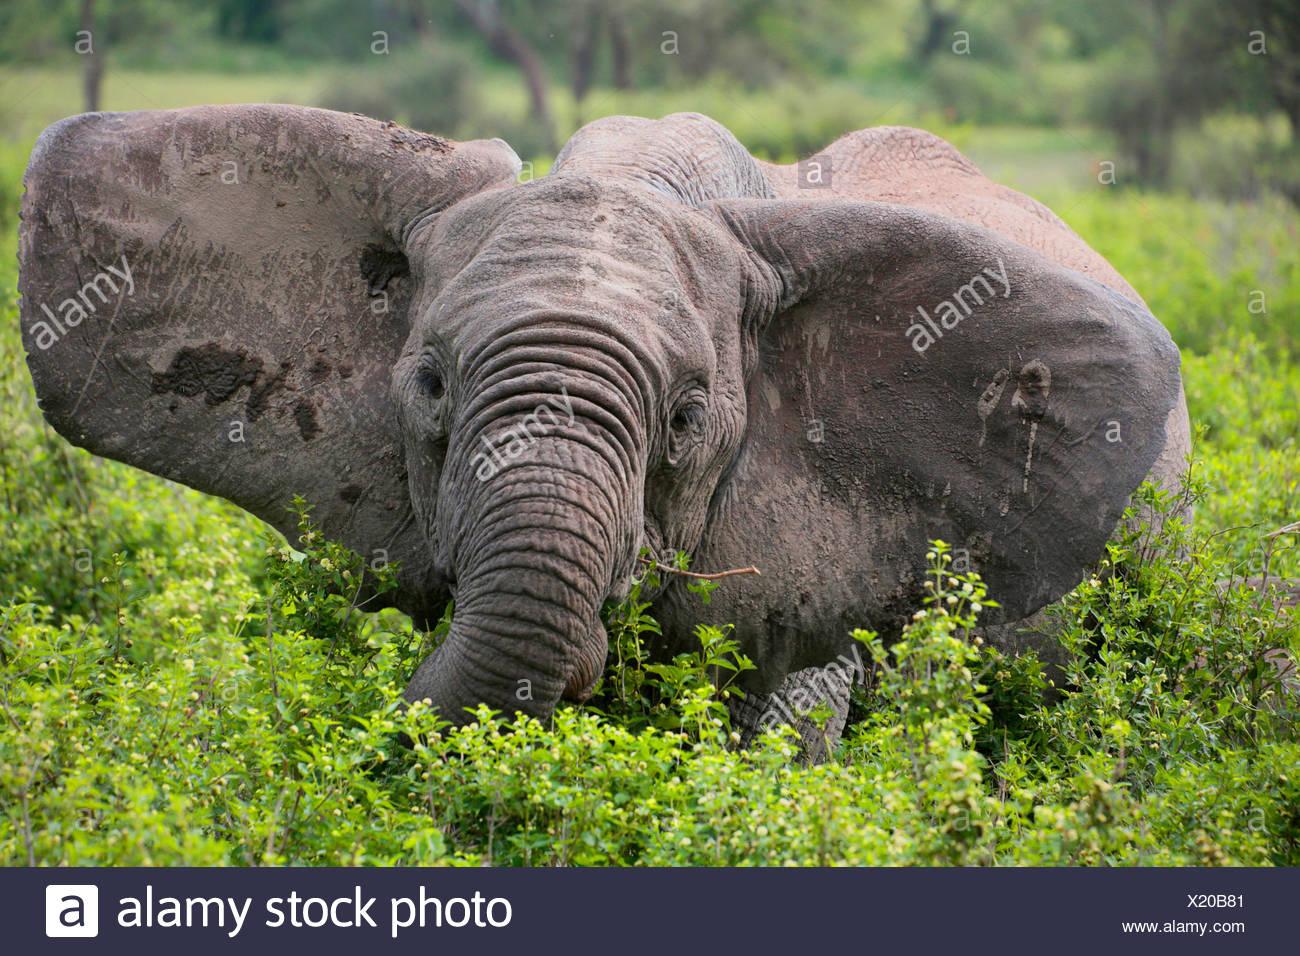 African elephant (Loxodonta africana), eating elephant with pricked up ears, Tanzania, Serengeti National Park - Stock Image